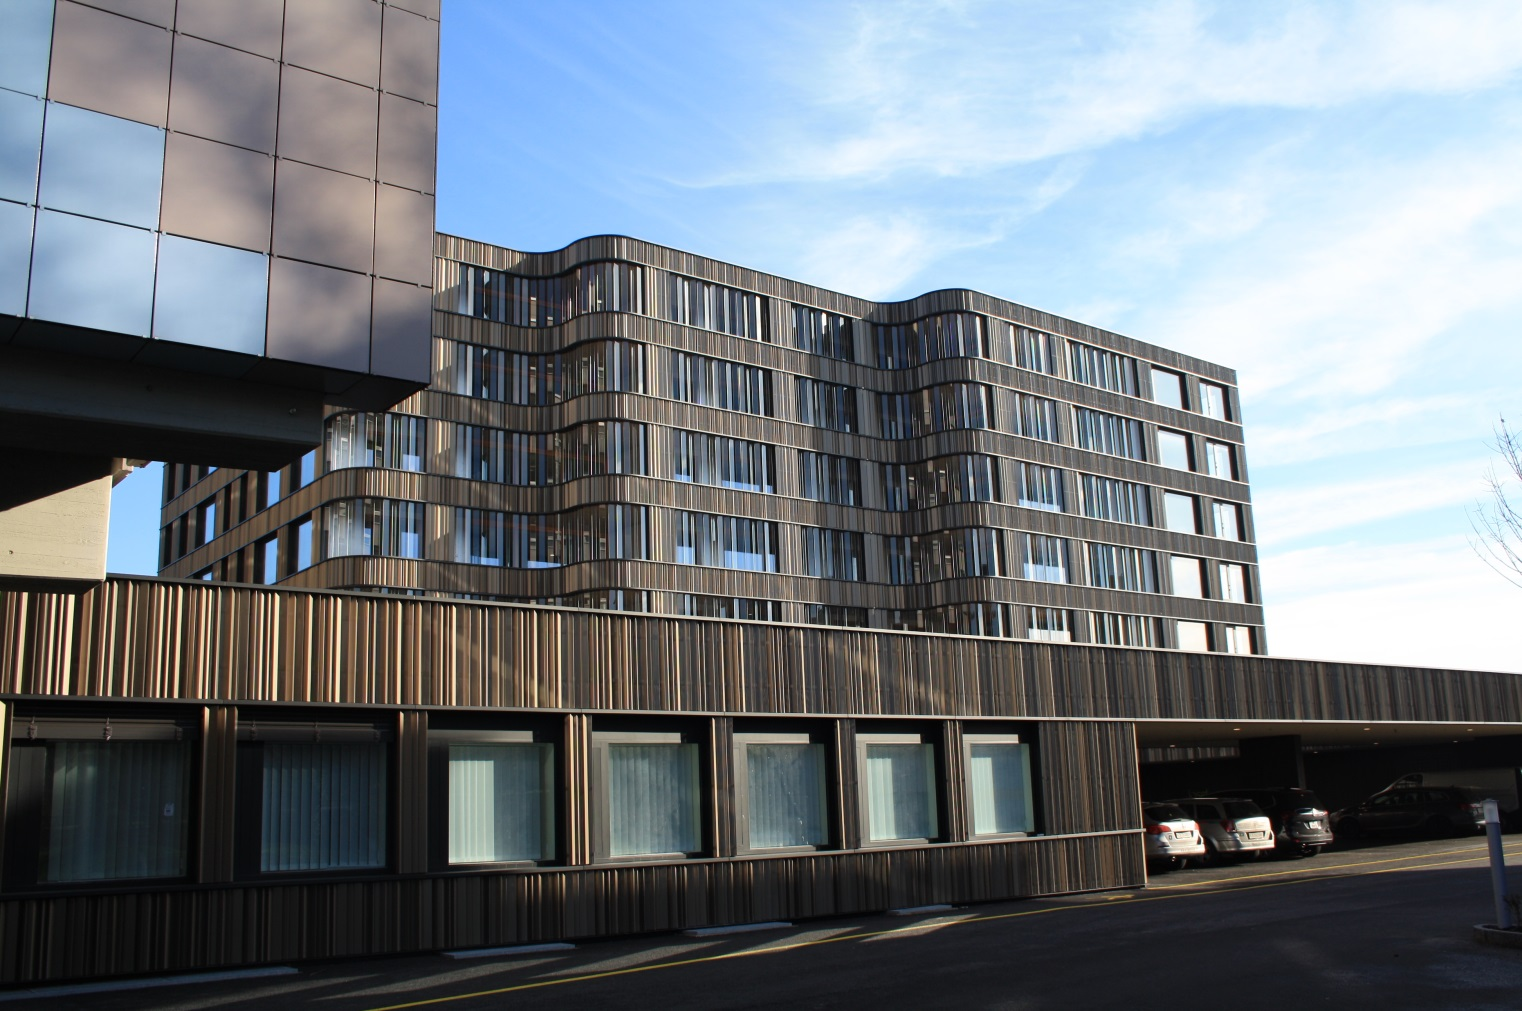 St Josef Stiftung